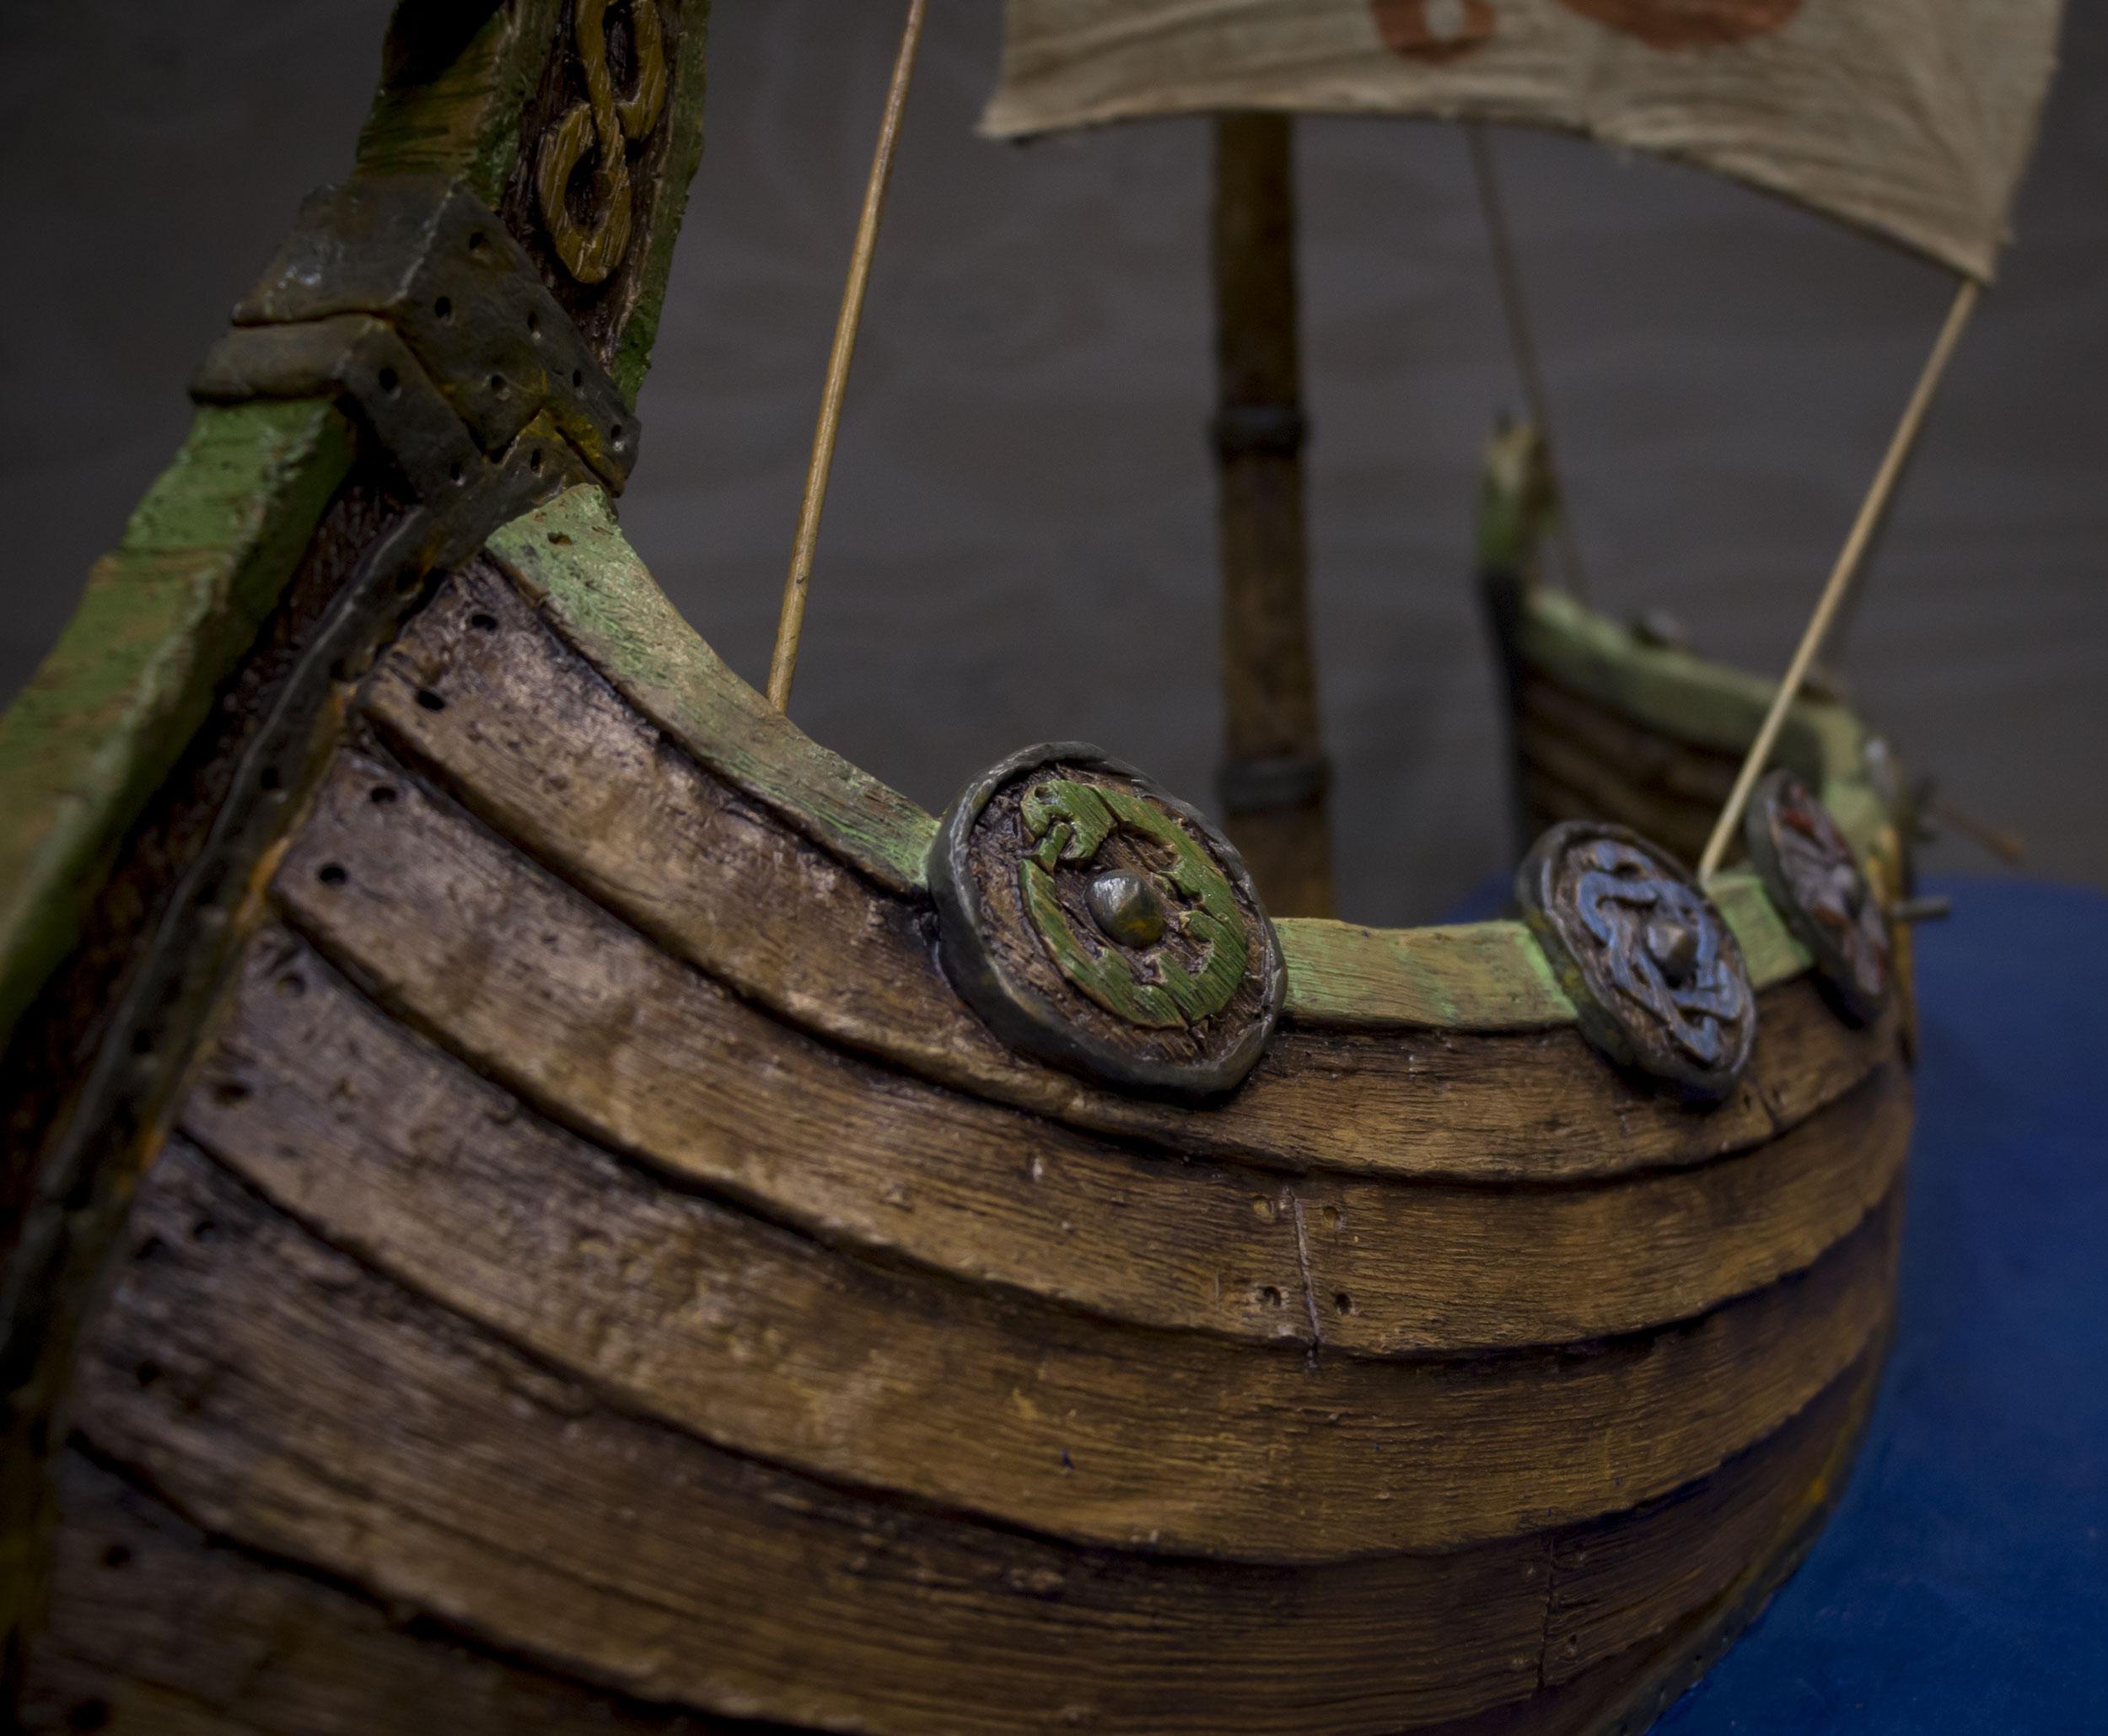 viking-ship-model-9.jpg